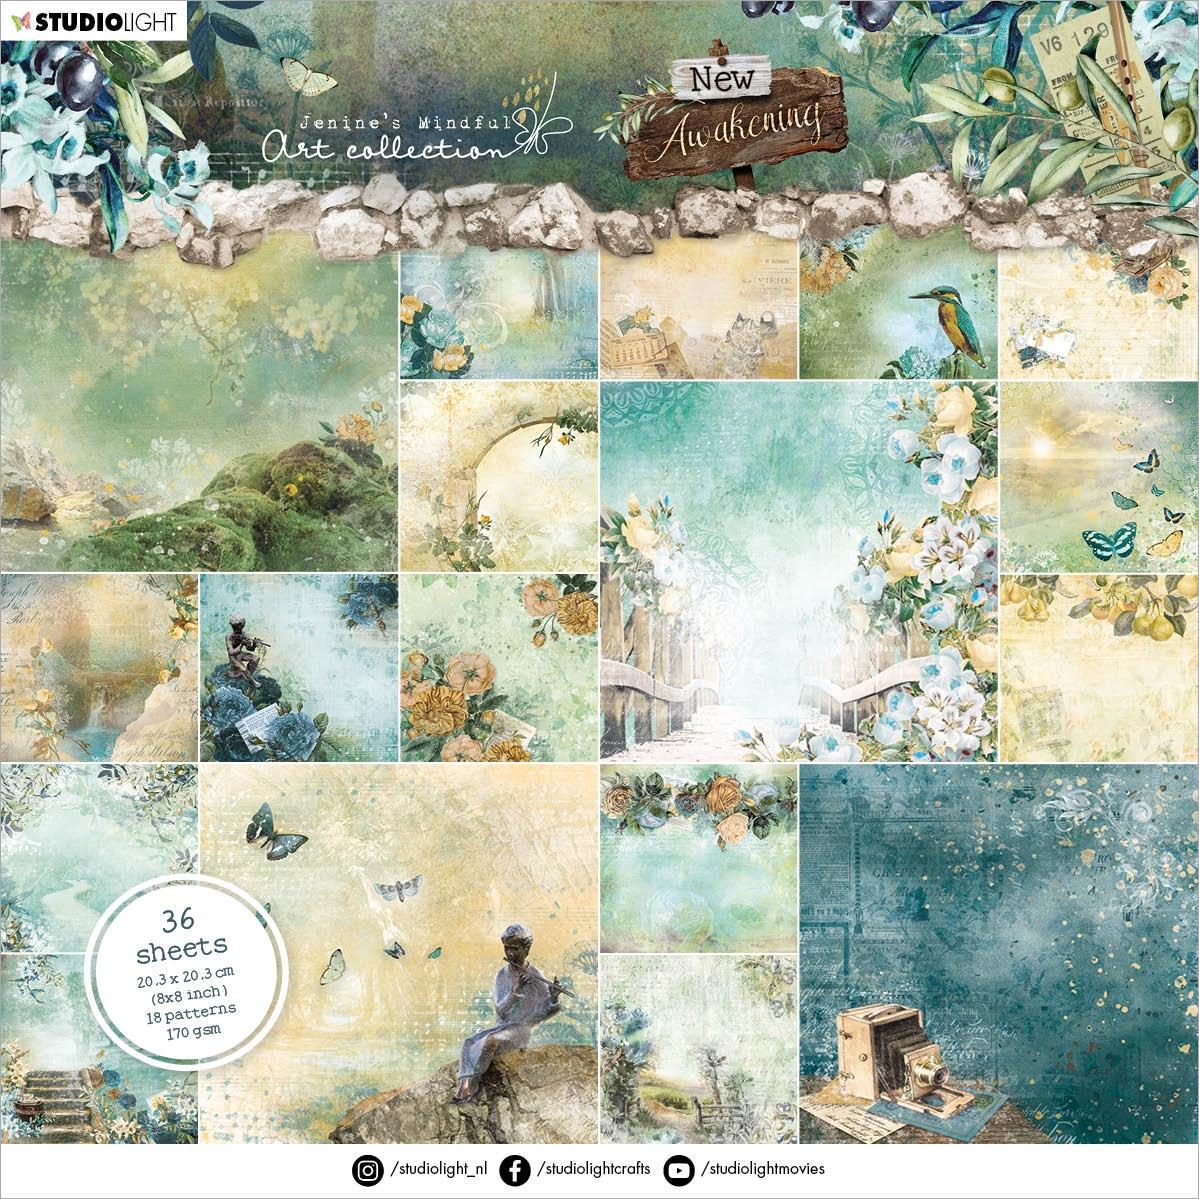 Studio Light Jenine's Mindful Art Paper Pad 8X8 36/Pkg-NR. 01, New Awakening Patterns